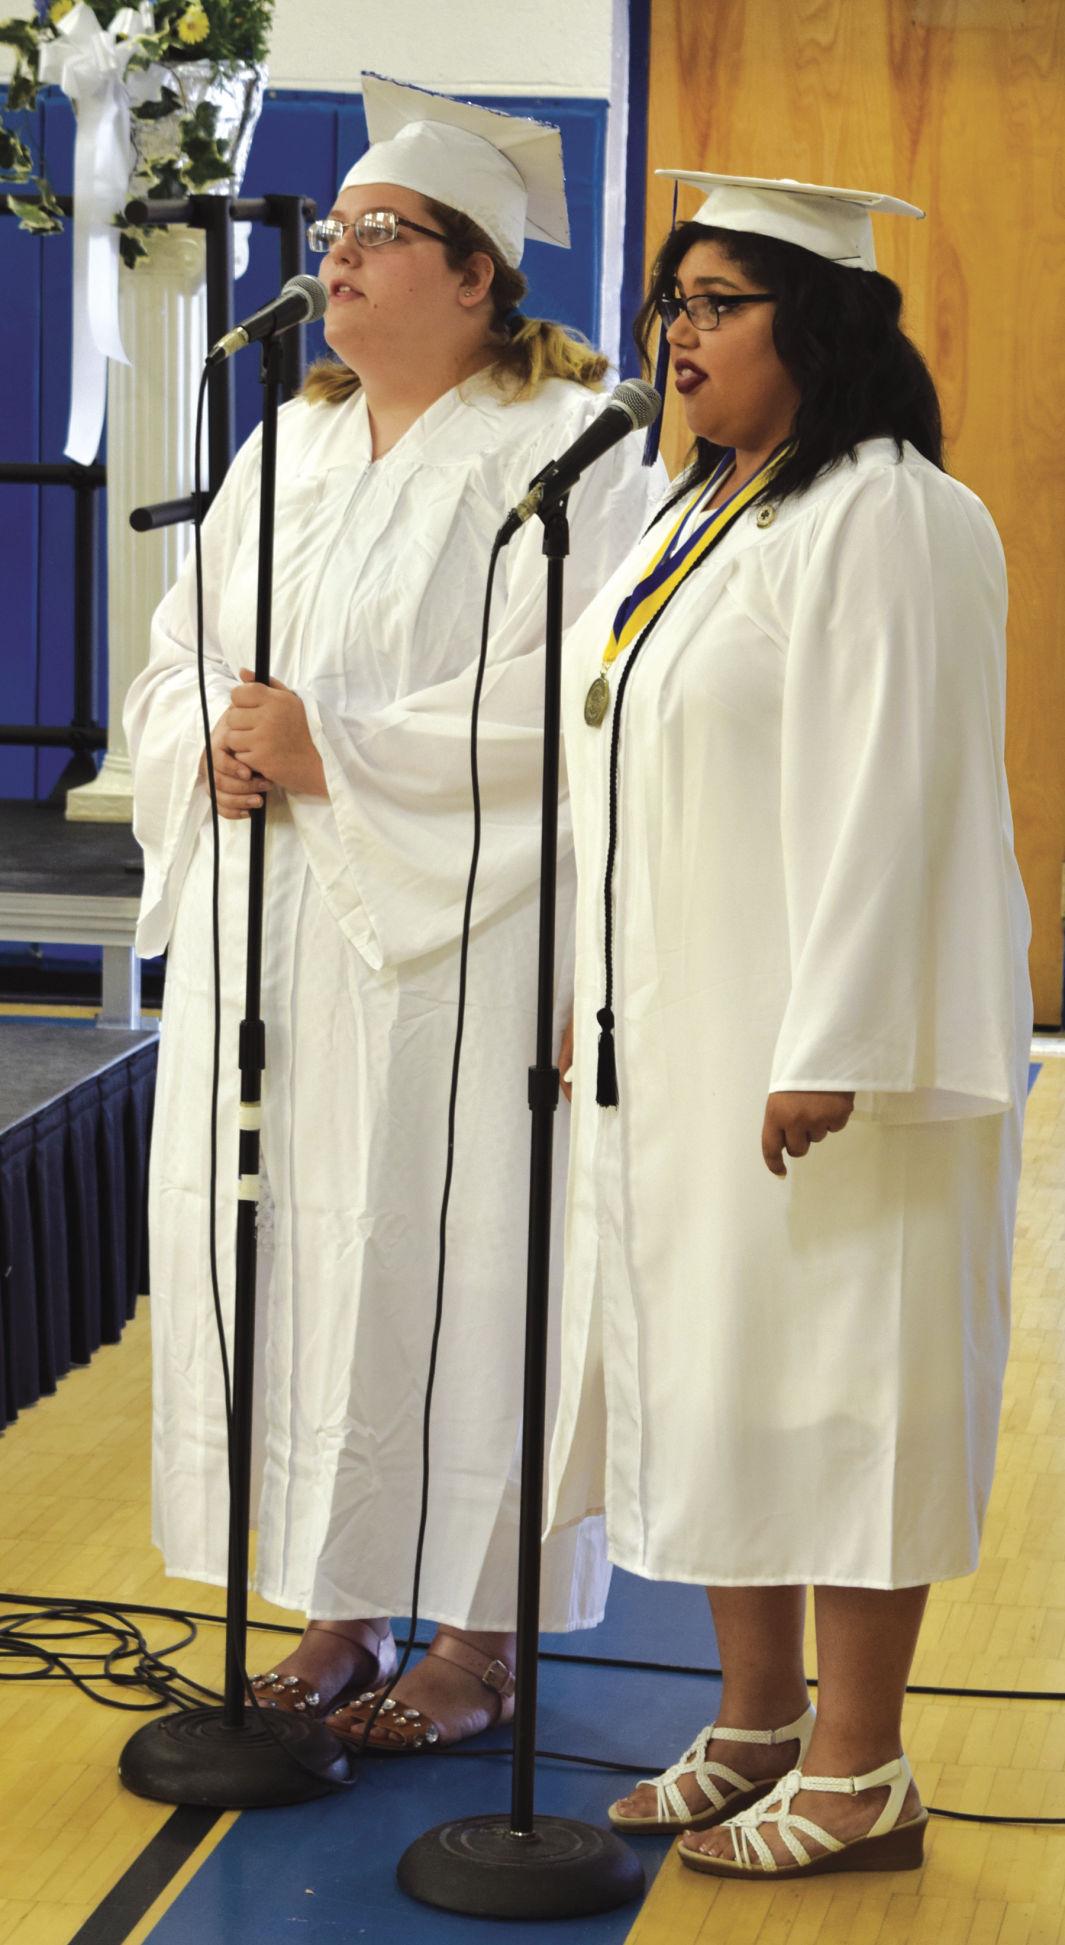 GHS Graduation - Seniors Brianna Taylor and Elizabeth Anderson